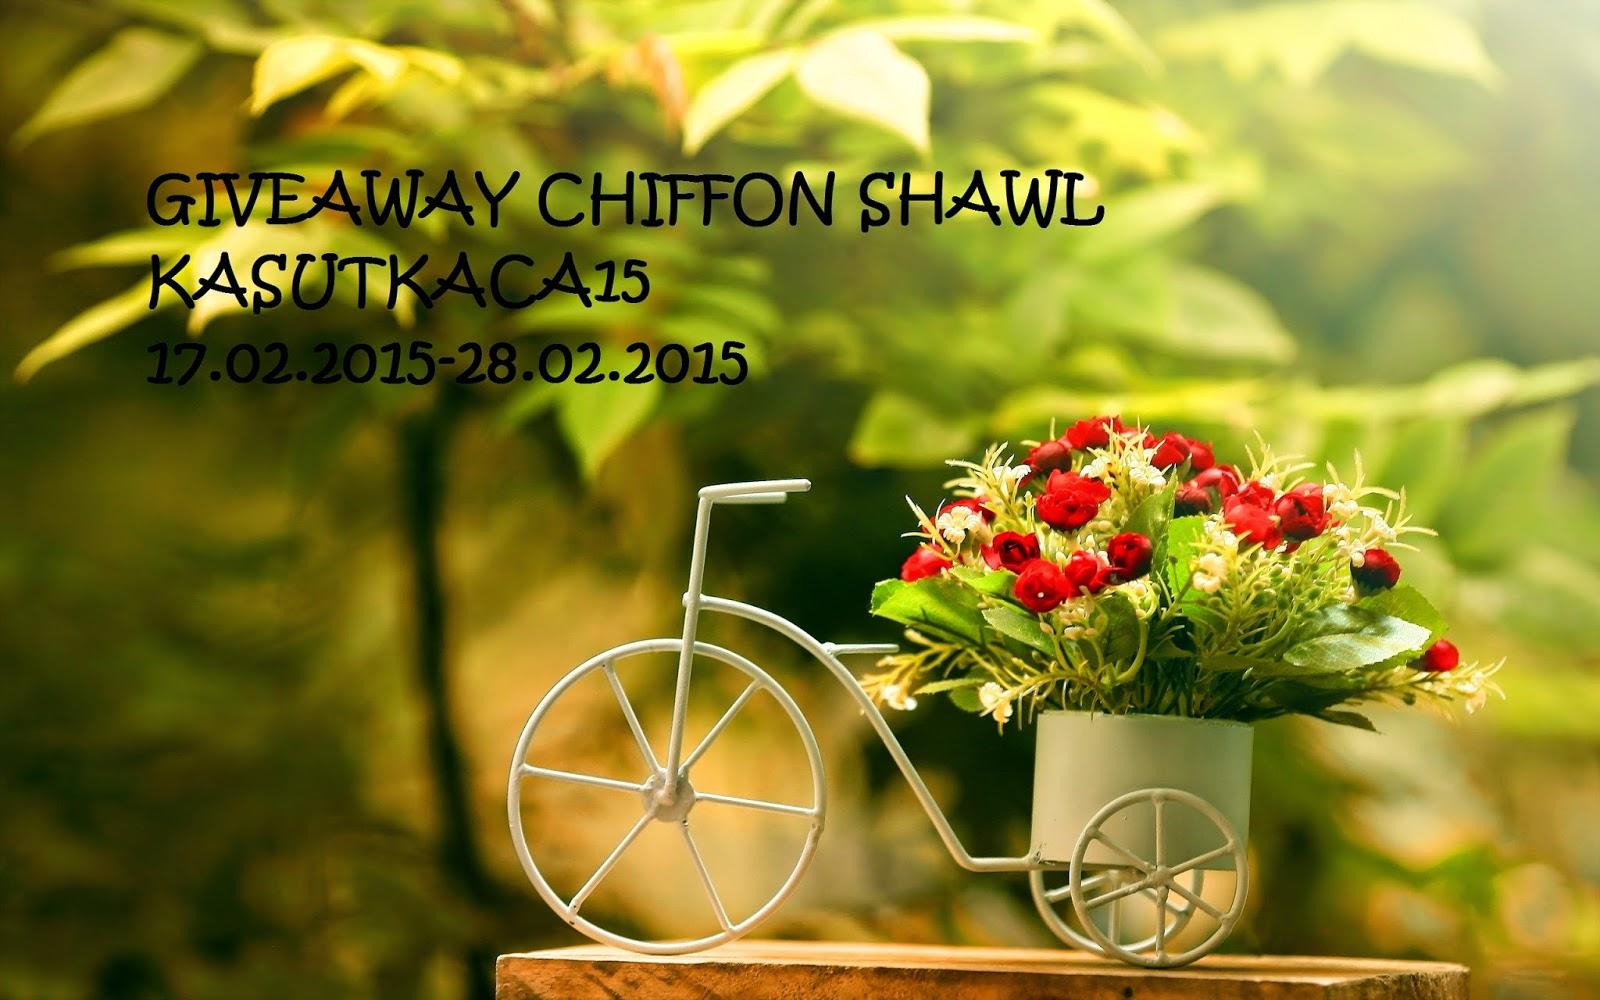 KASUTKACA15 GA: CHIFFON SHAWL